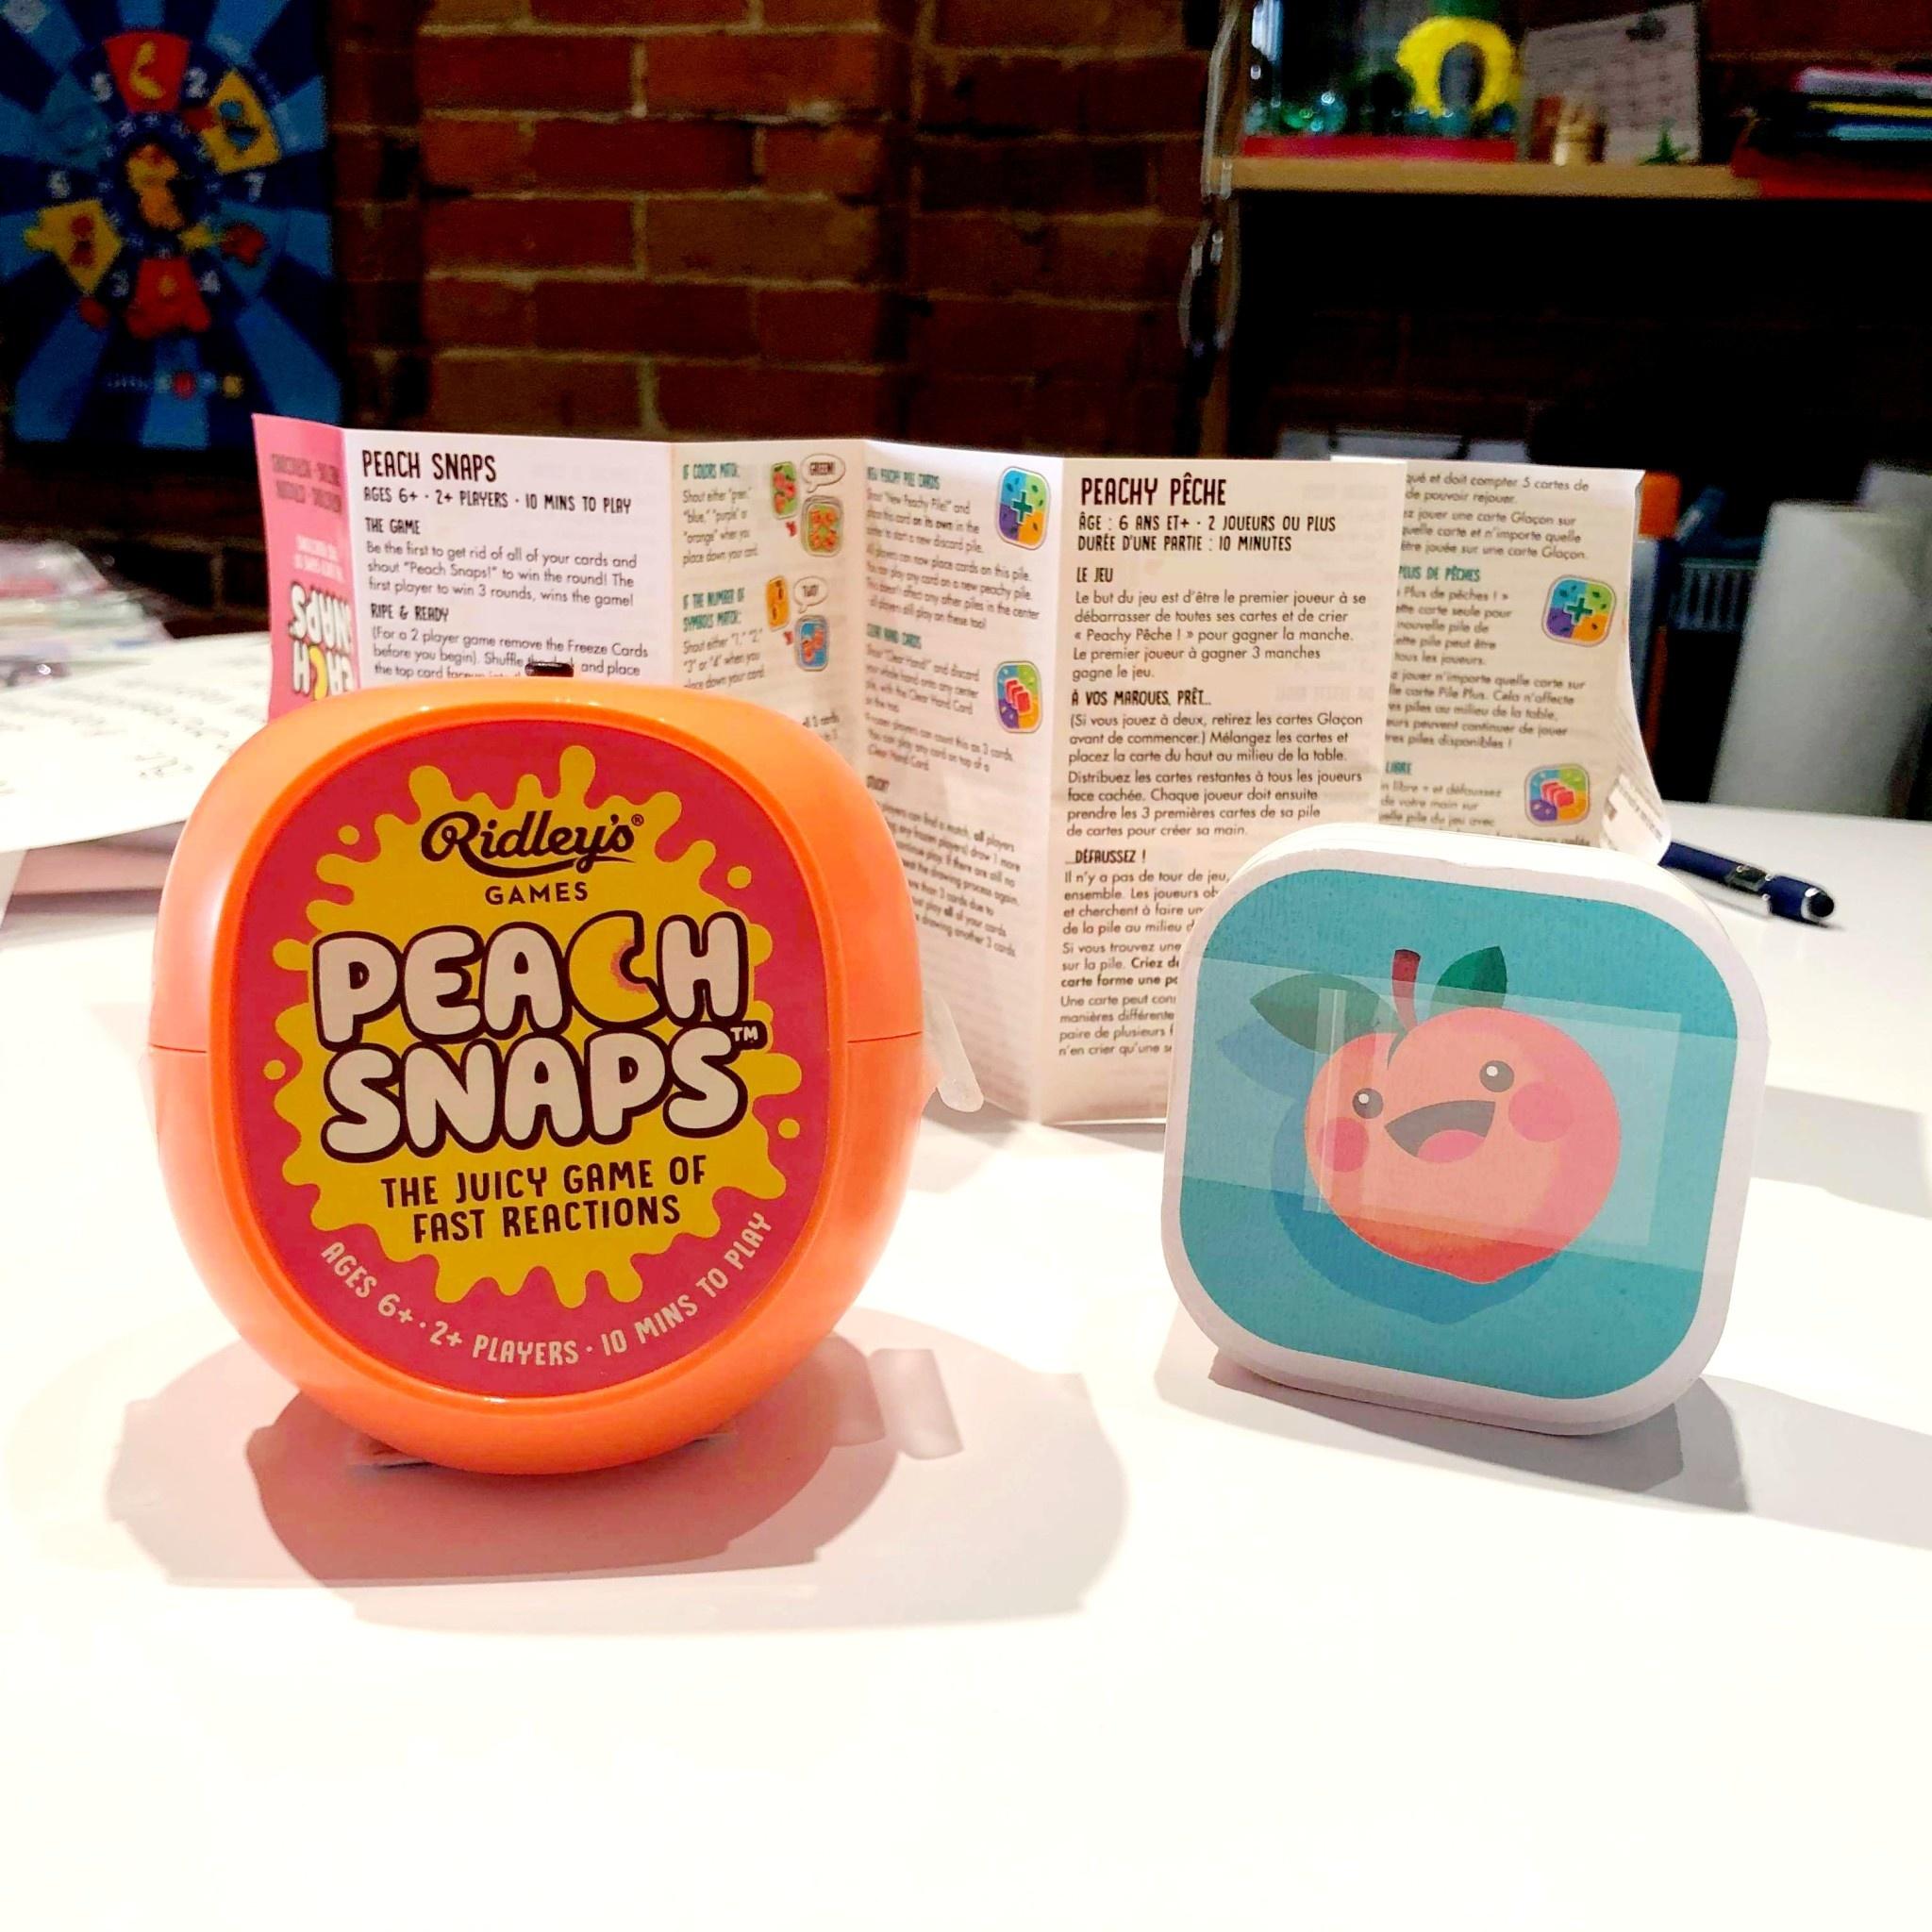 Peach Snaps